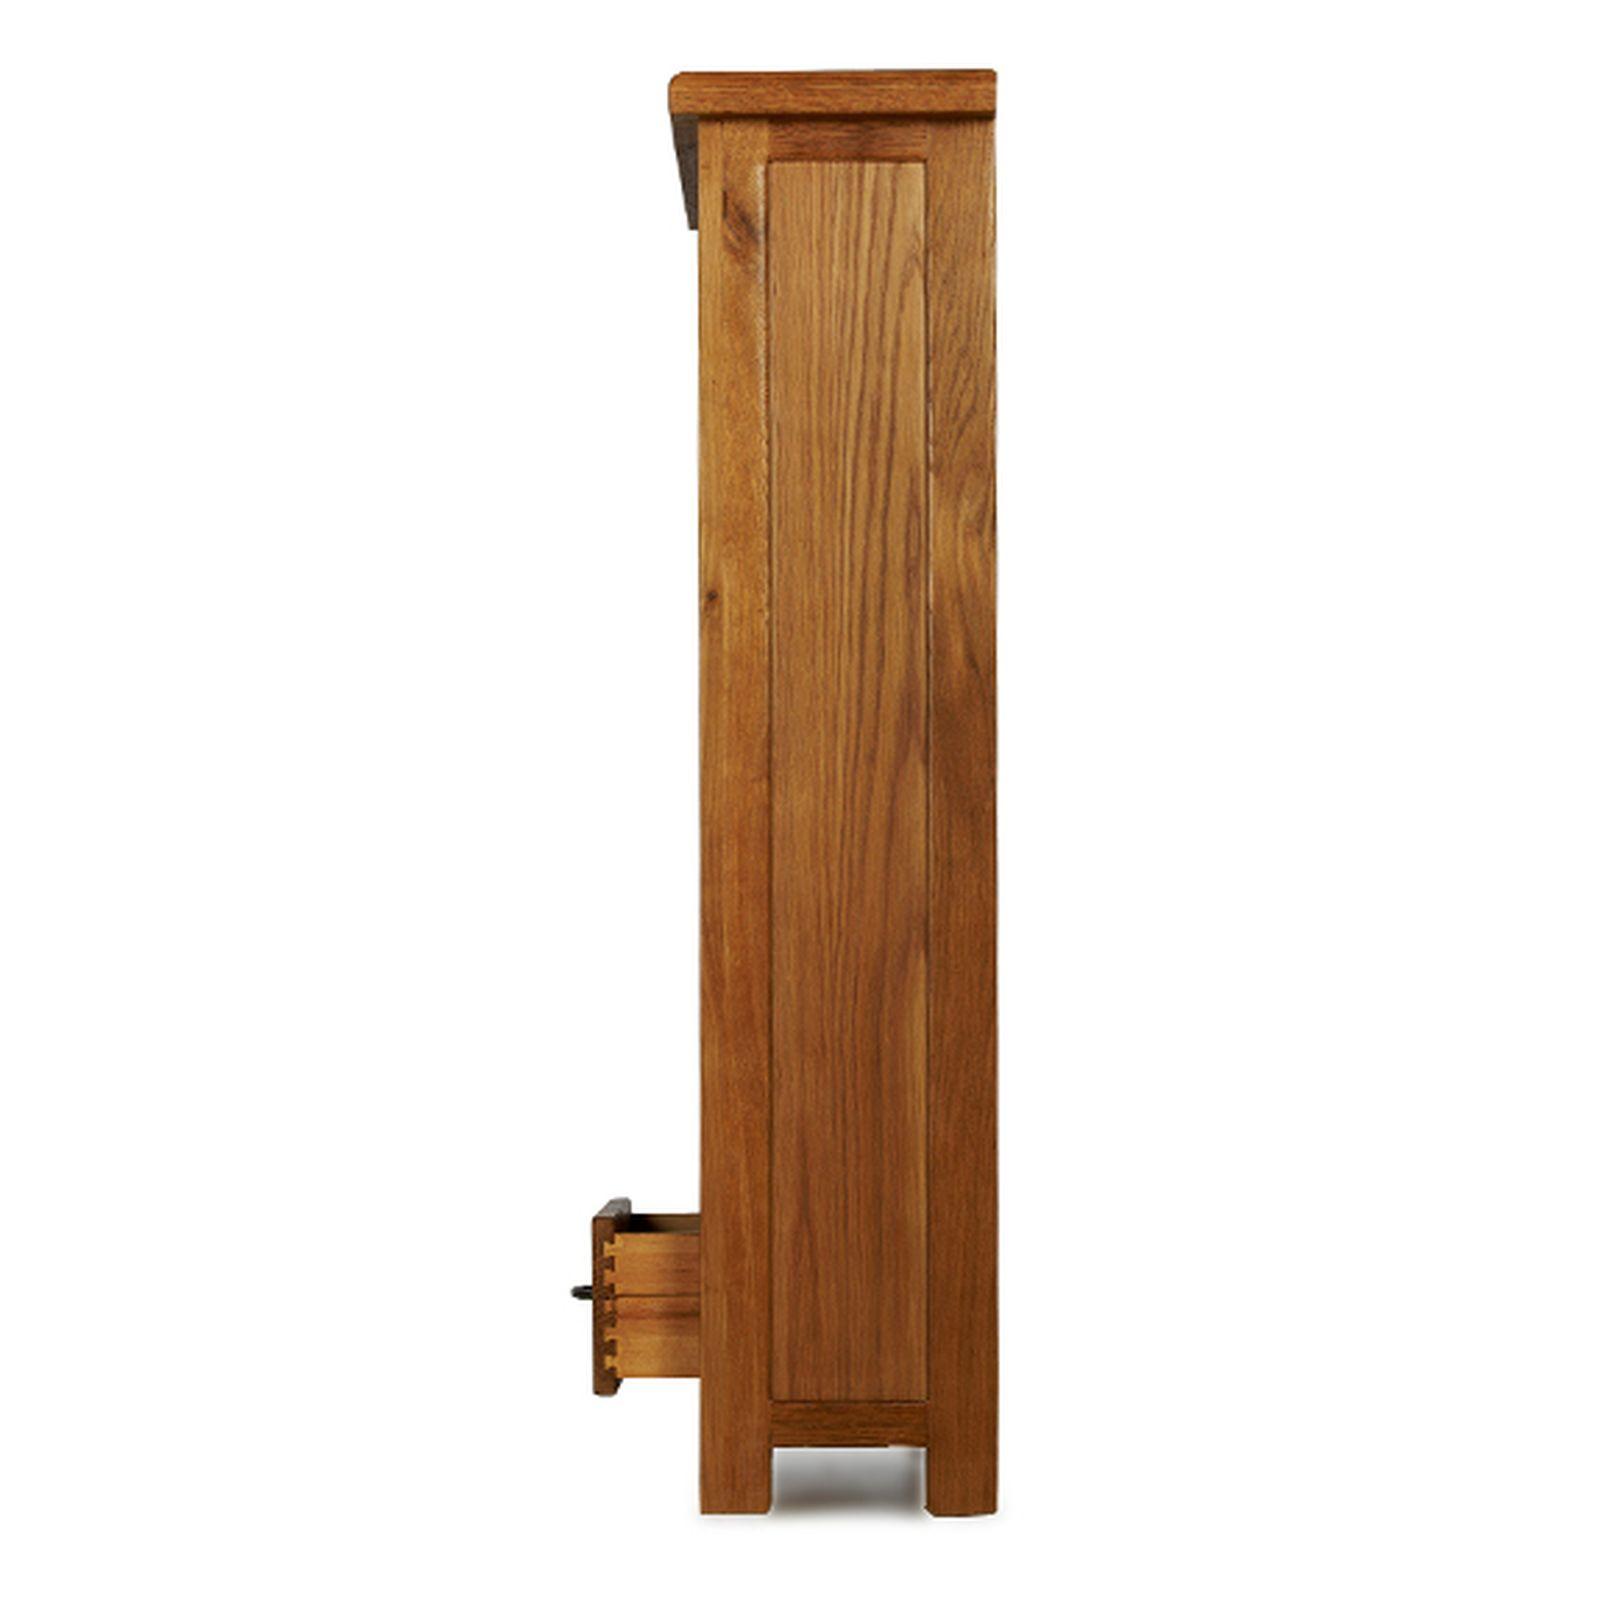 Rushden solid oak furniture CD DVD storage cabinet rack